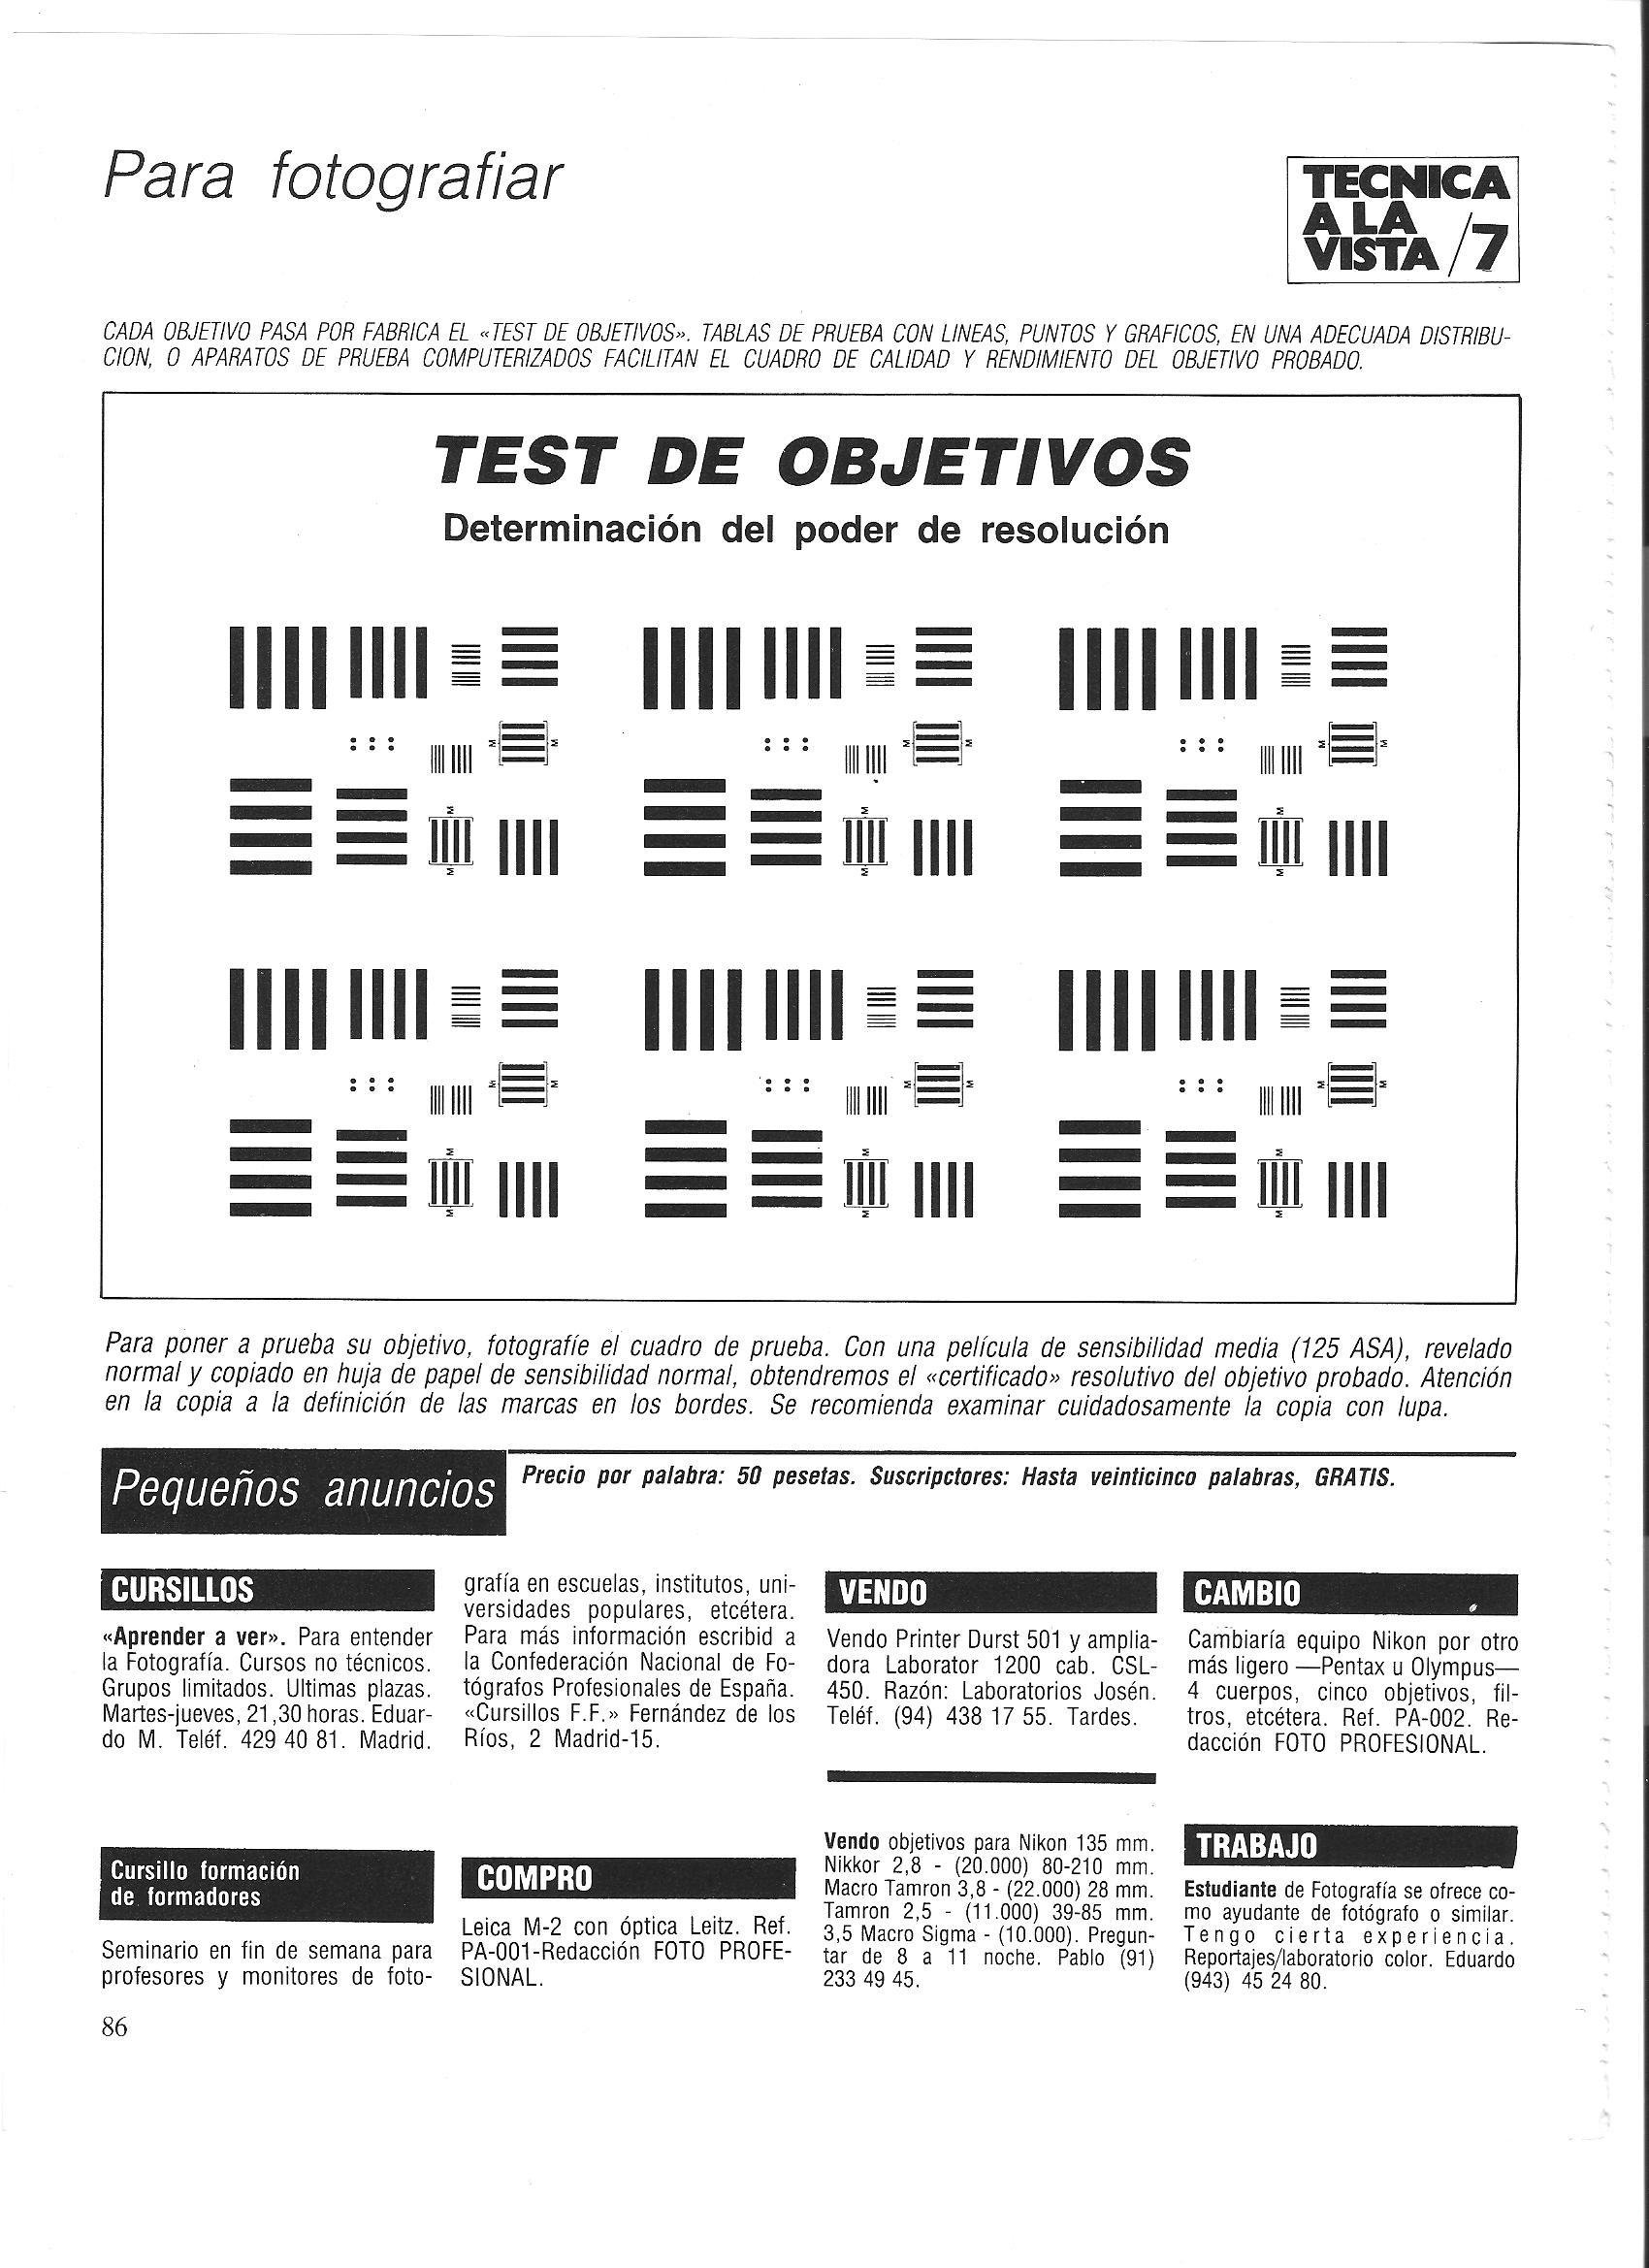 Test de Objetivos